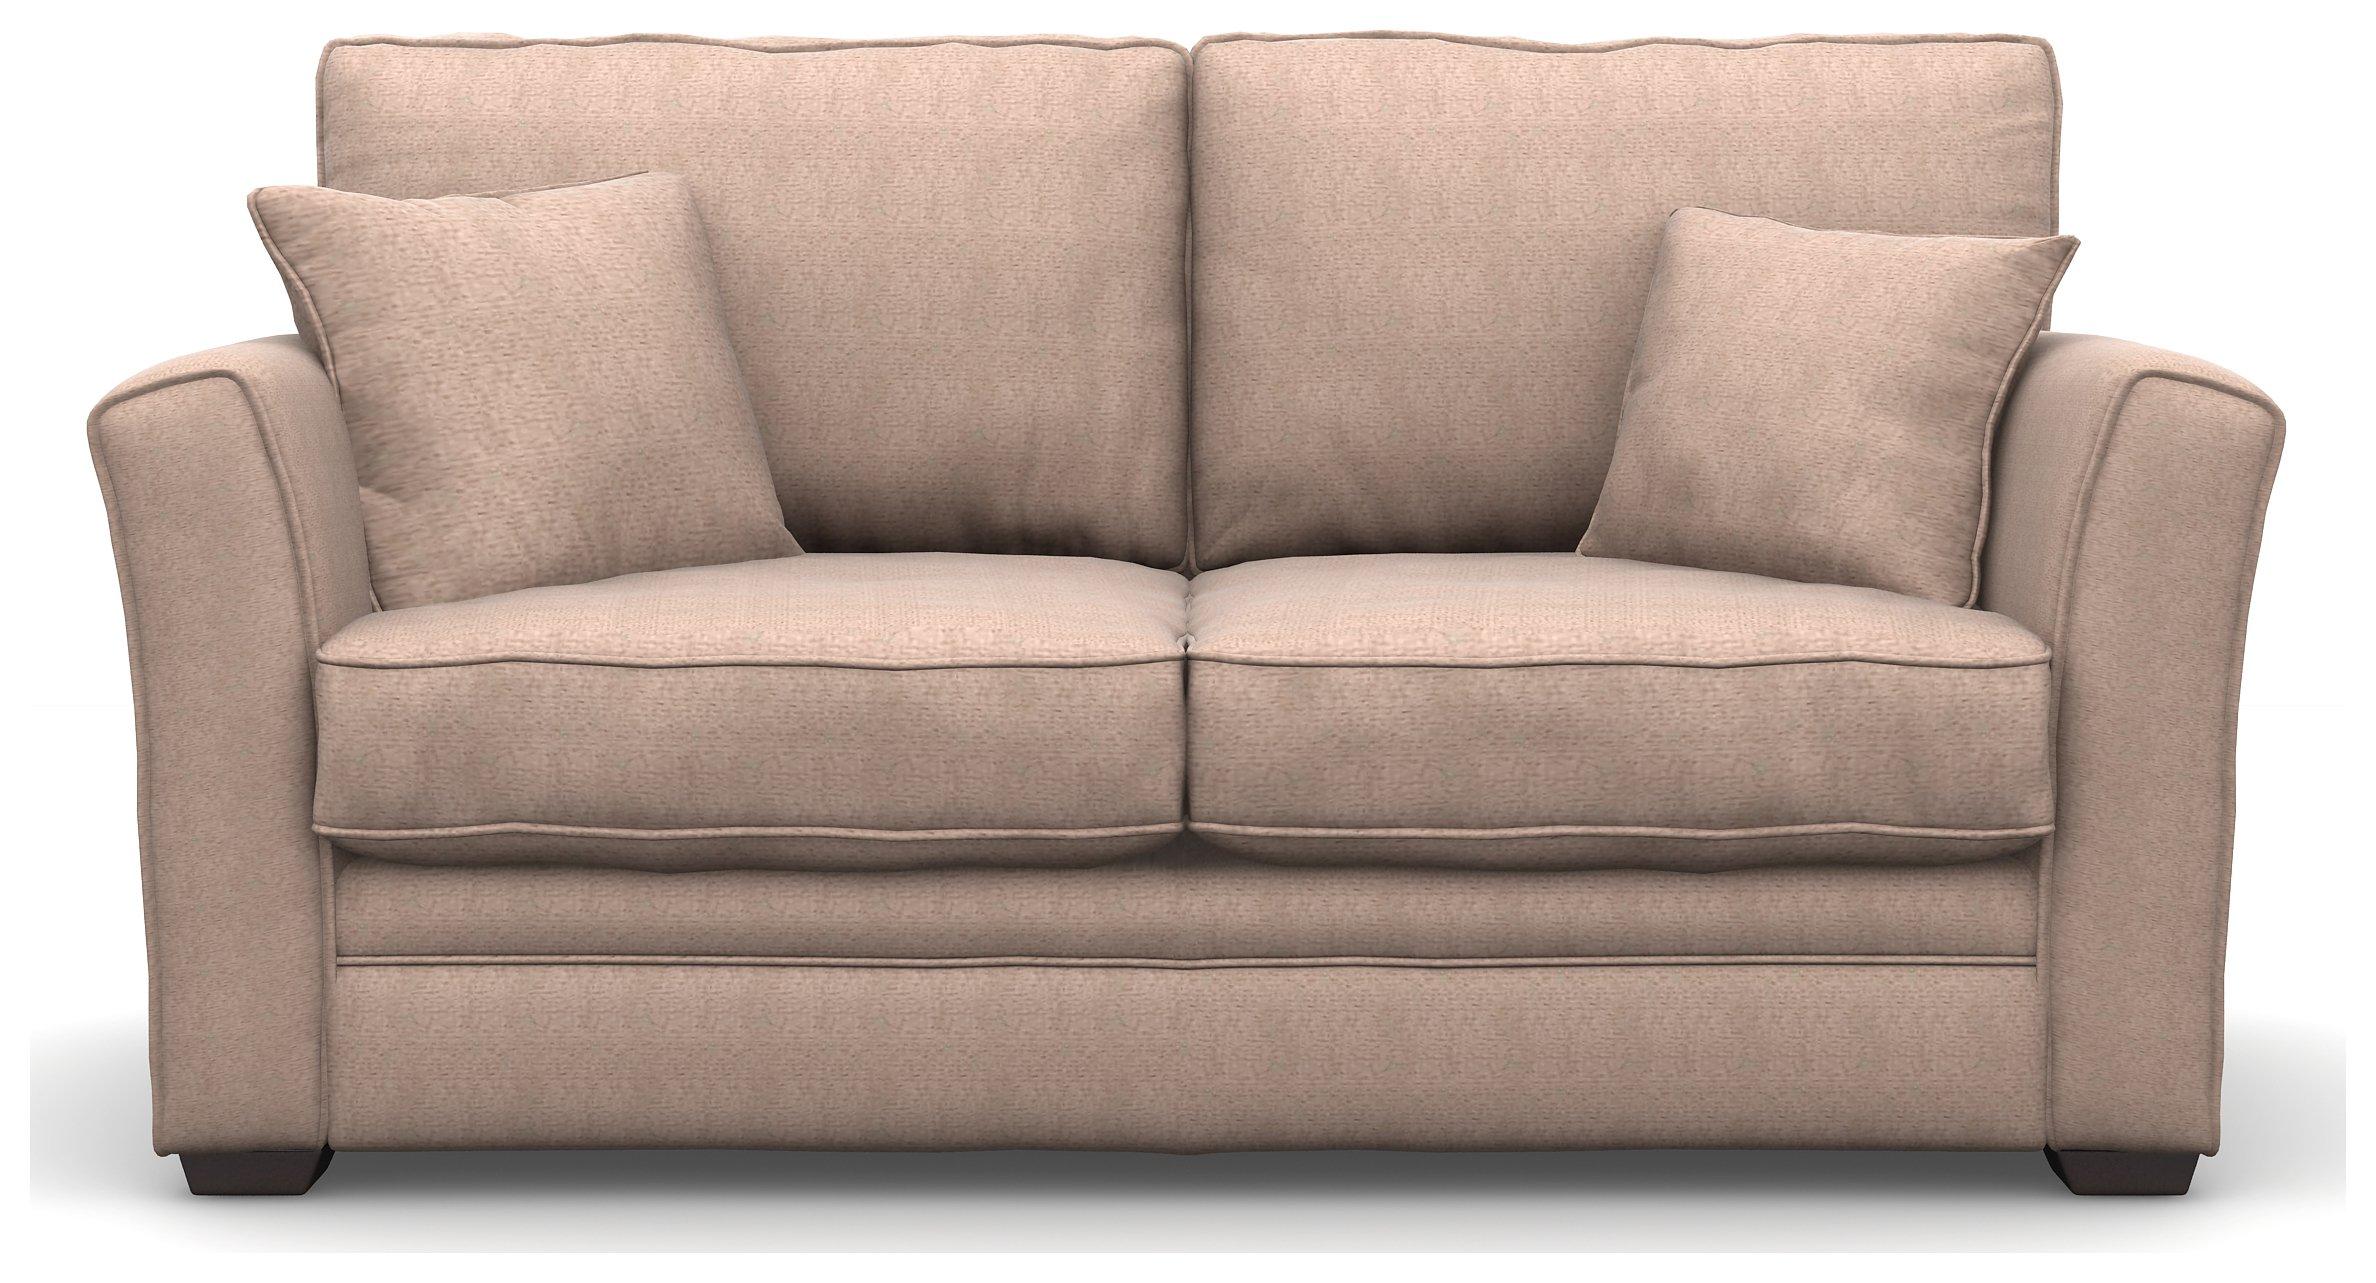 Heart of House Malton 2 Seater Fabric Sofa Bed - Stone + Black Legs